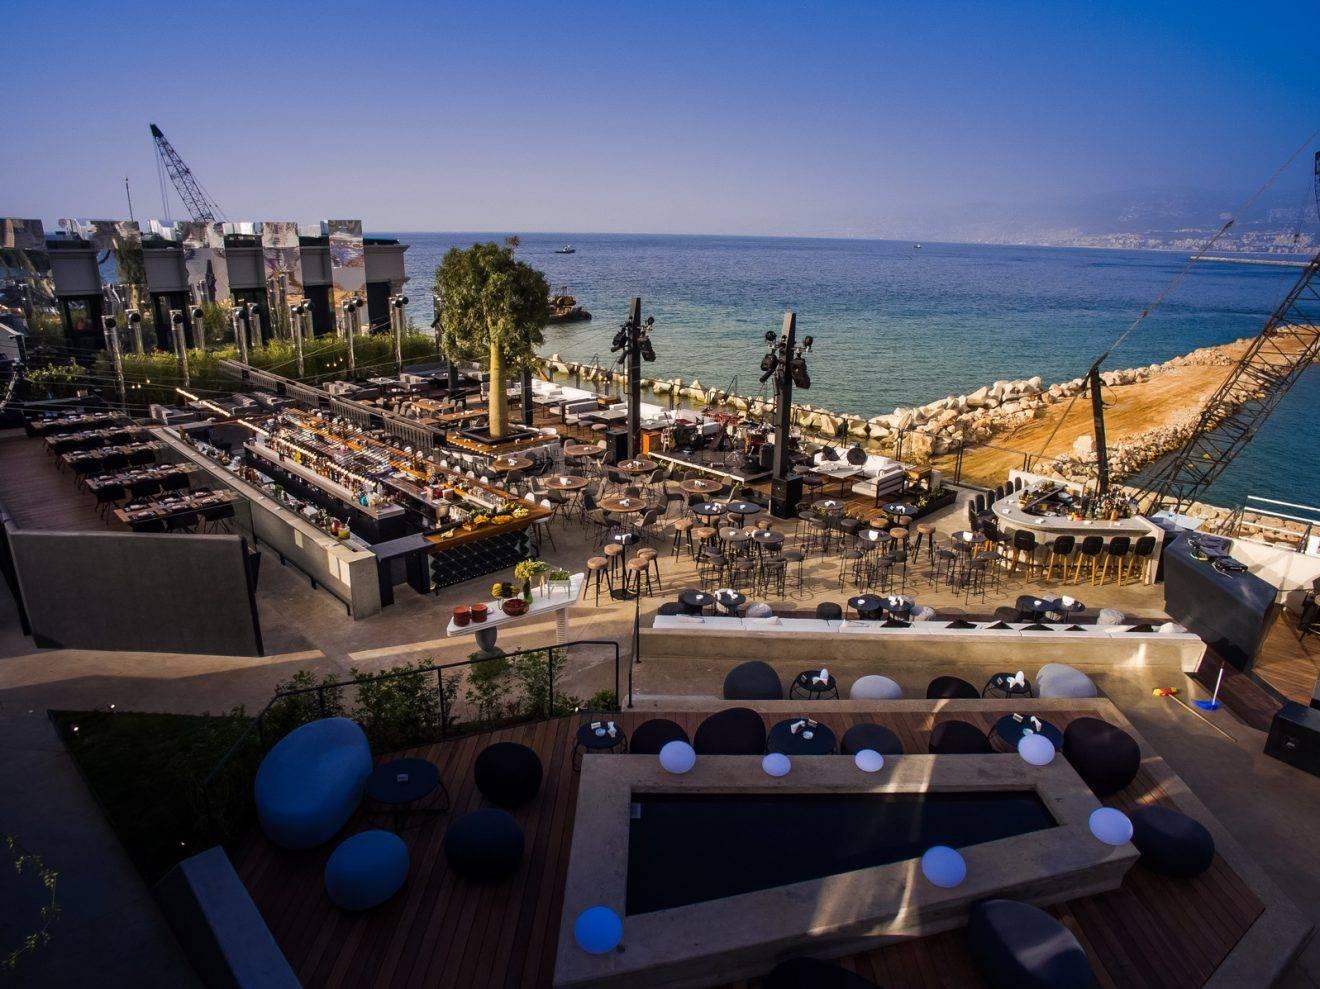 Beirut Nightclub Upgrades with K-array